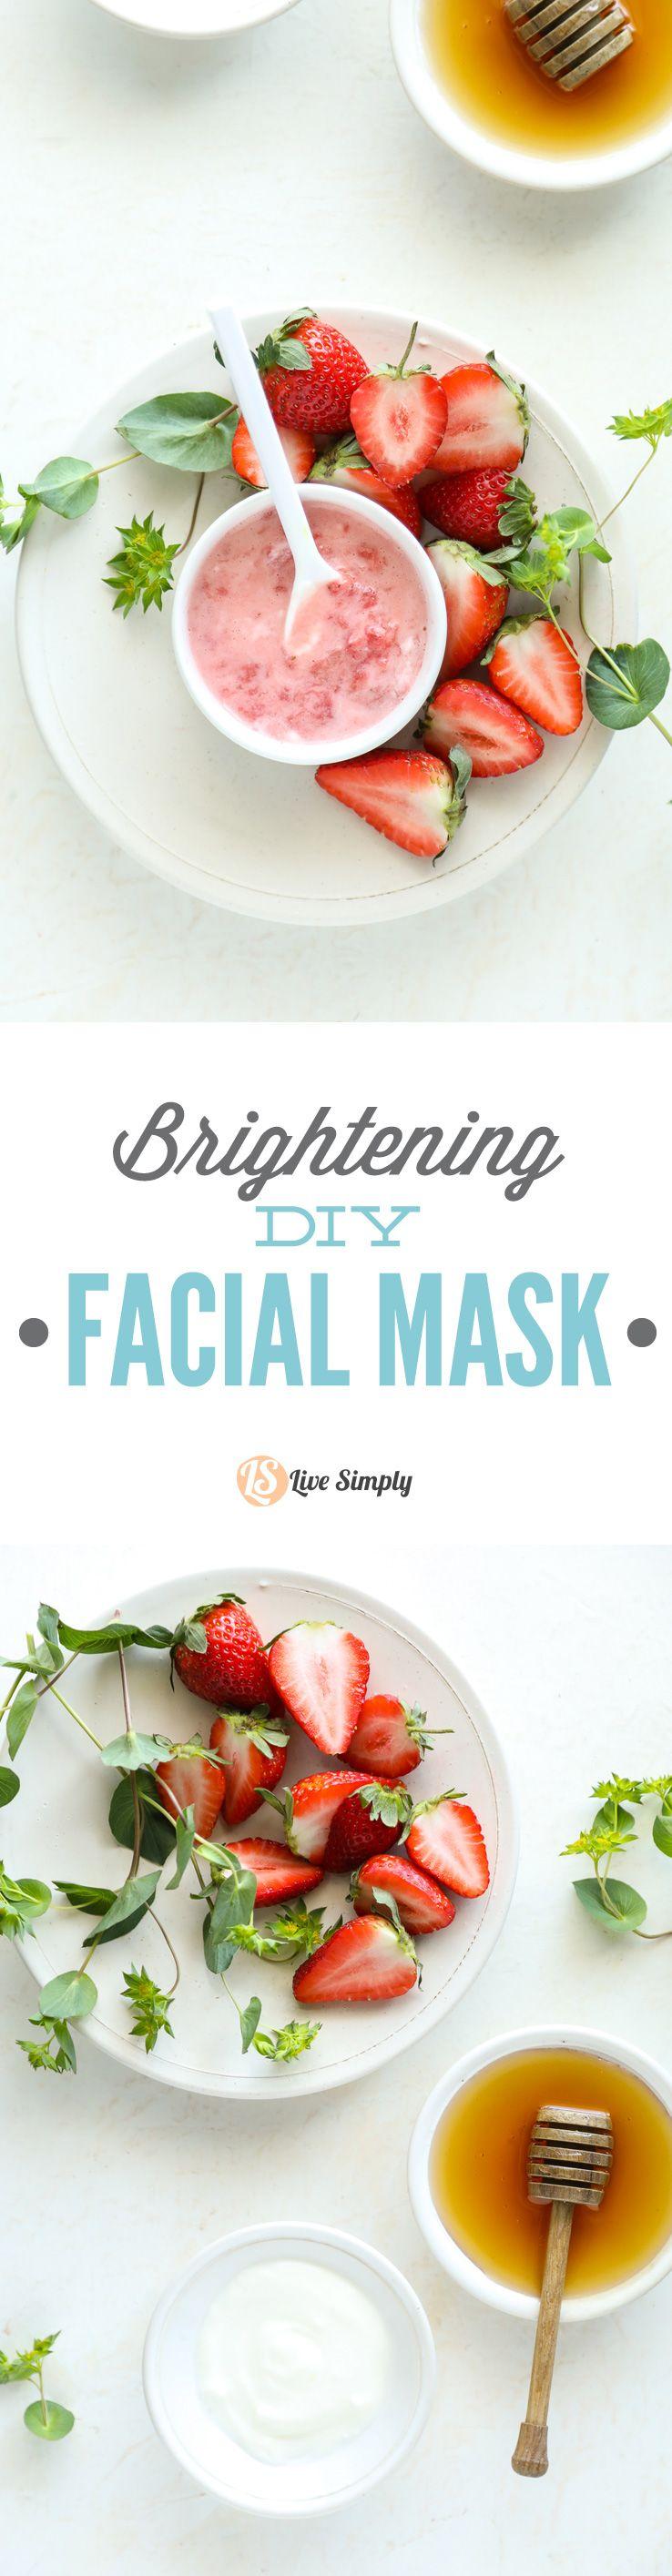 Strawberries and Yogurt Brightening DIY Facial Mask – Live Simply